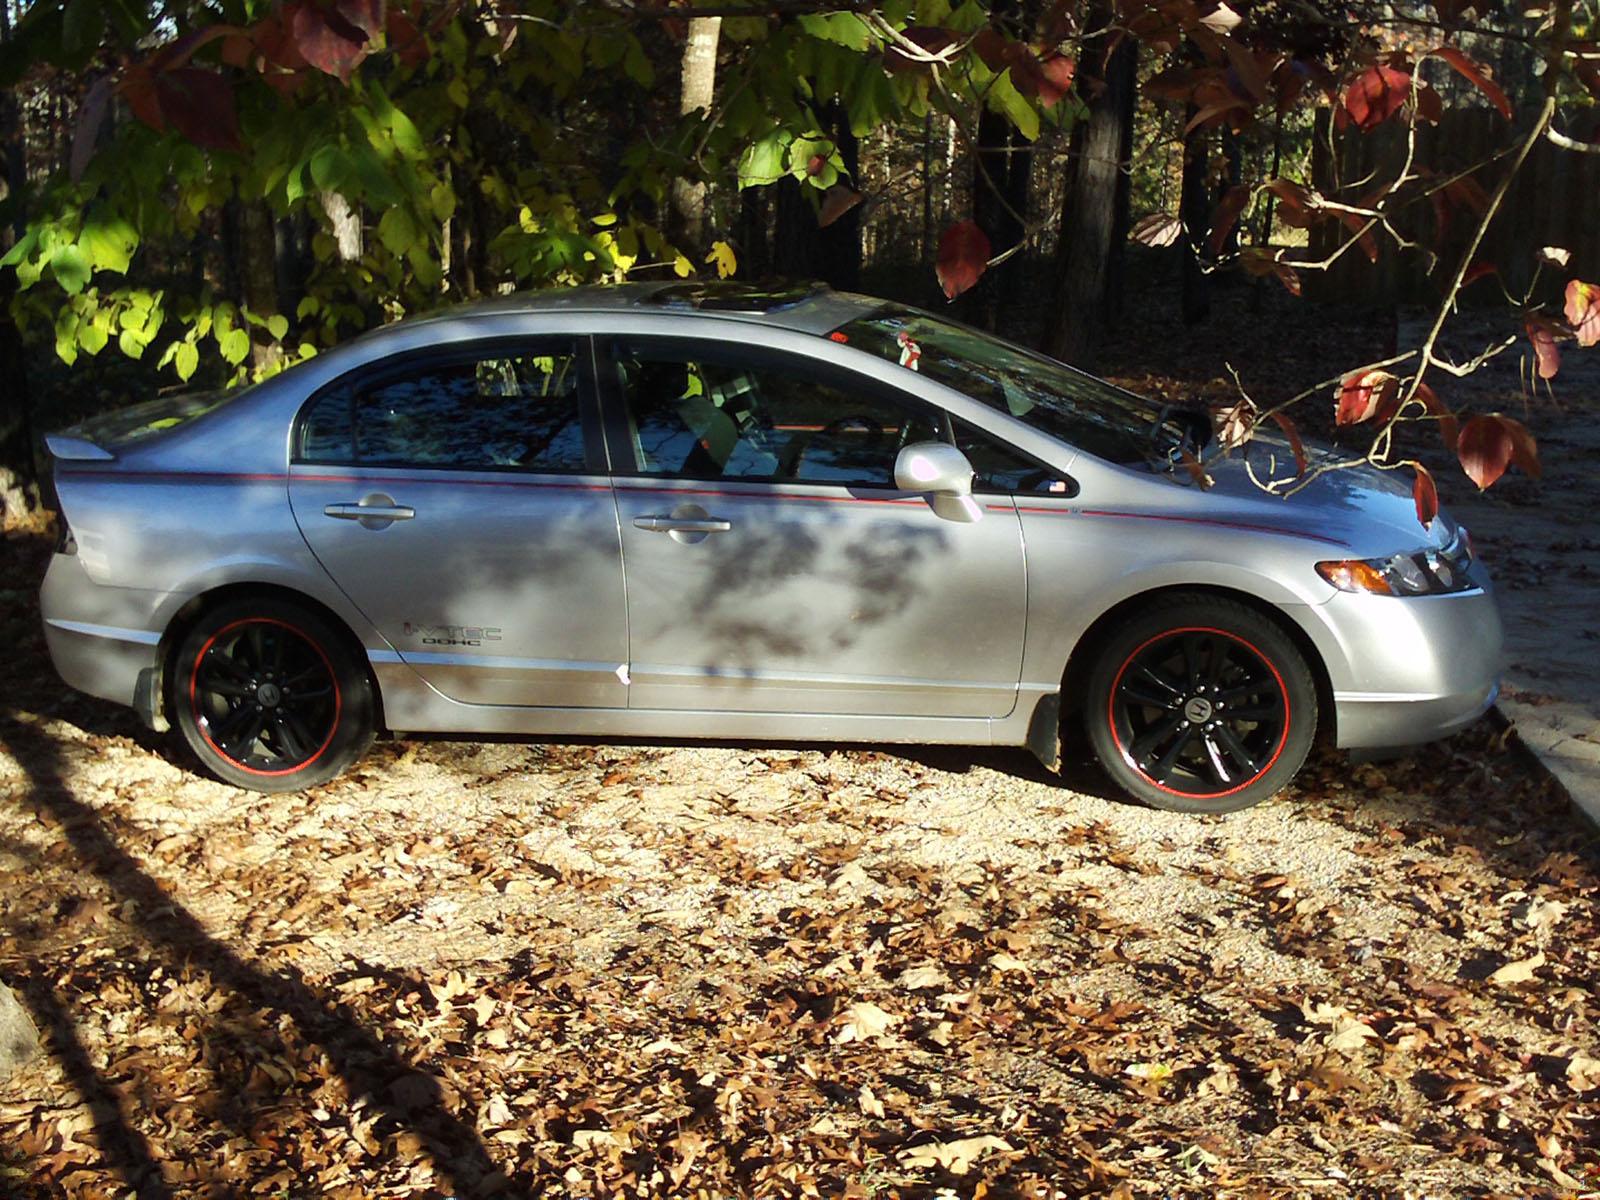 2007 Honda Civic Si For Sale Chelsea Alabama